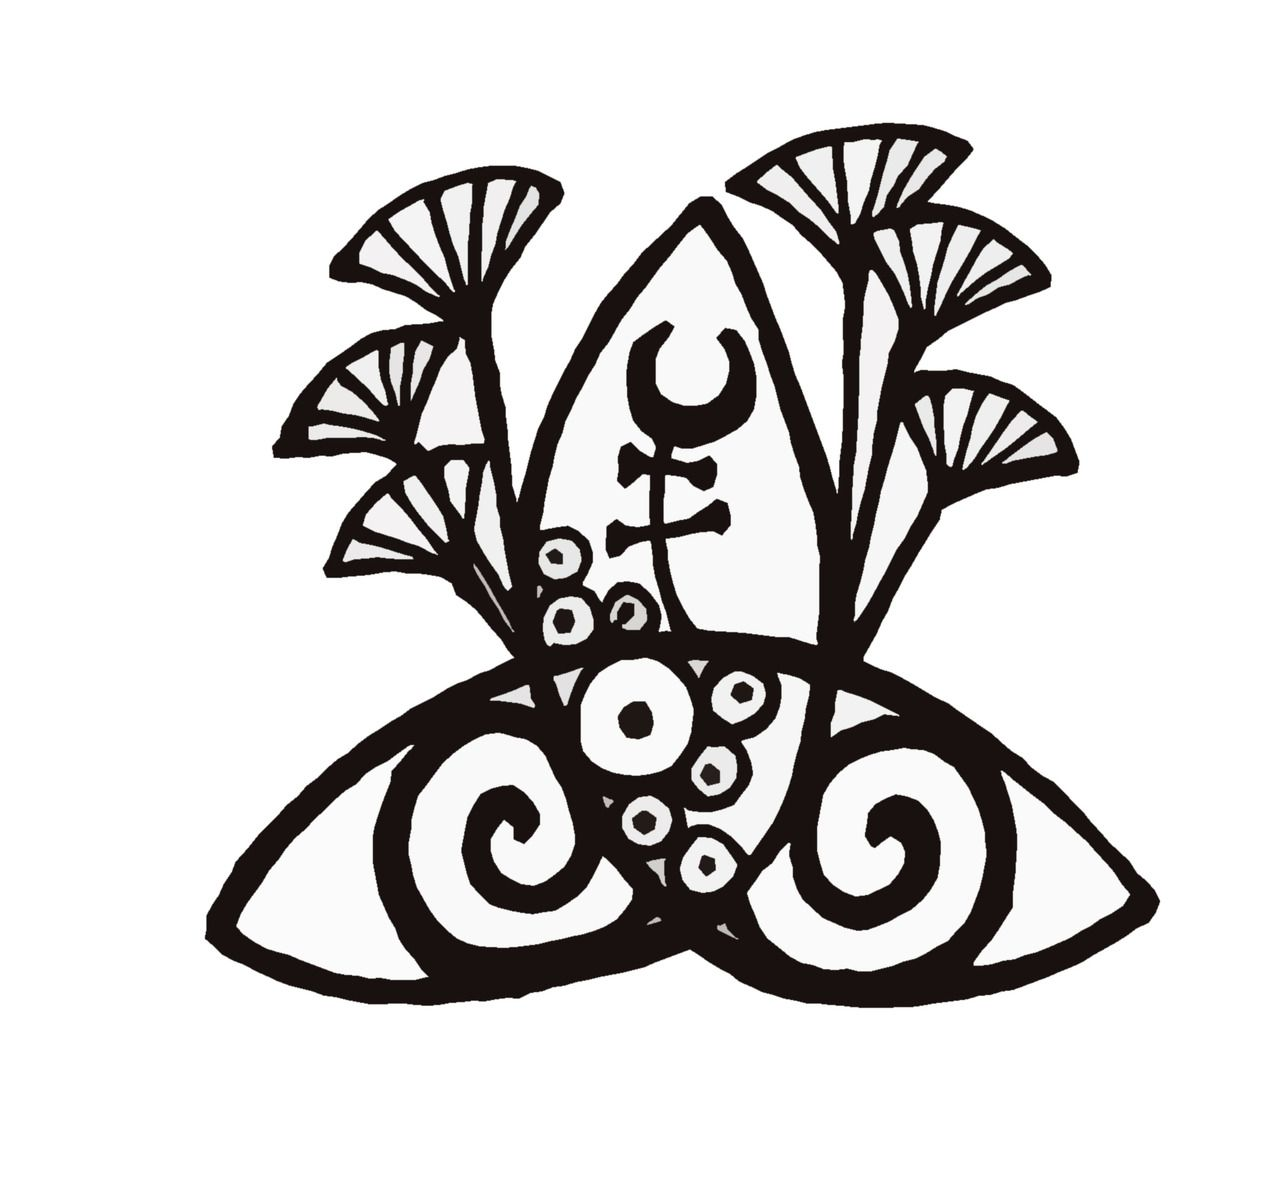 Druid symbols of protection celtic eternity symbol designs for druid symbols of protection celtic eternity symbol buycottarizona Image collections